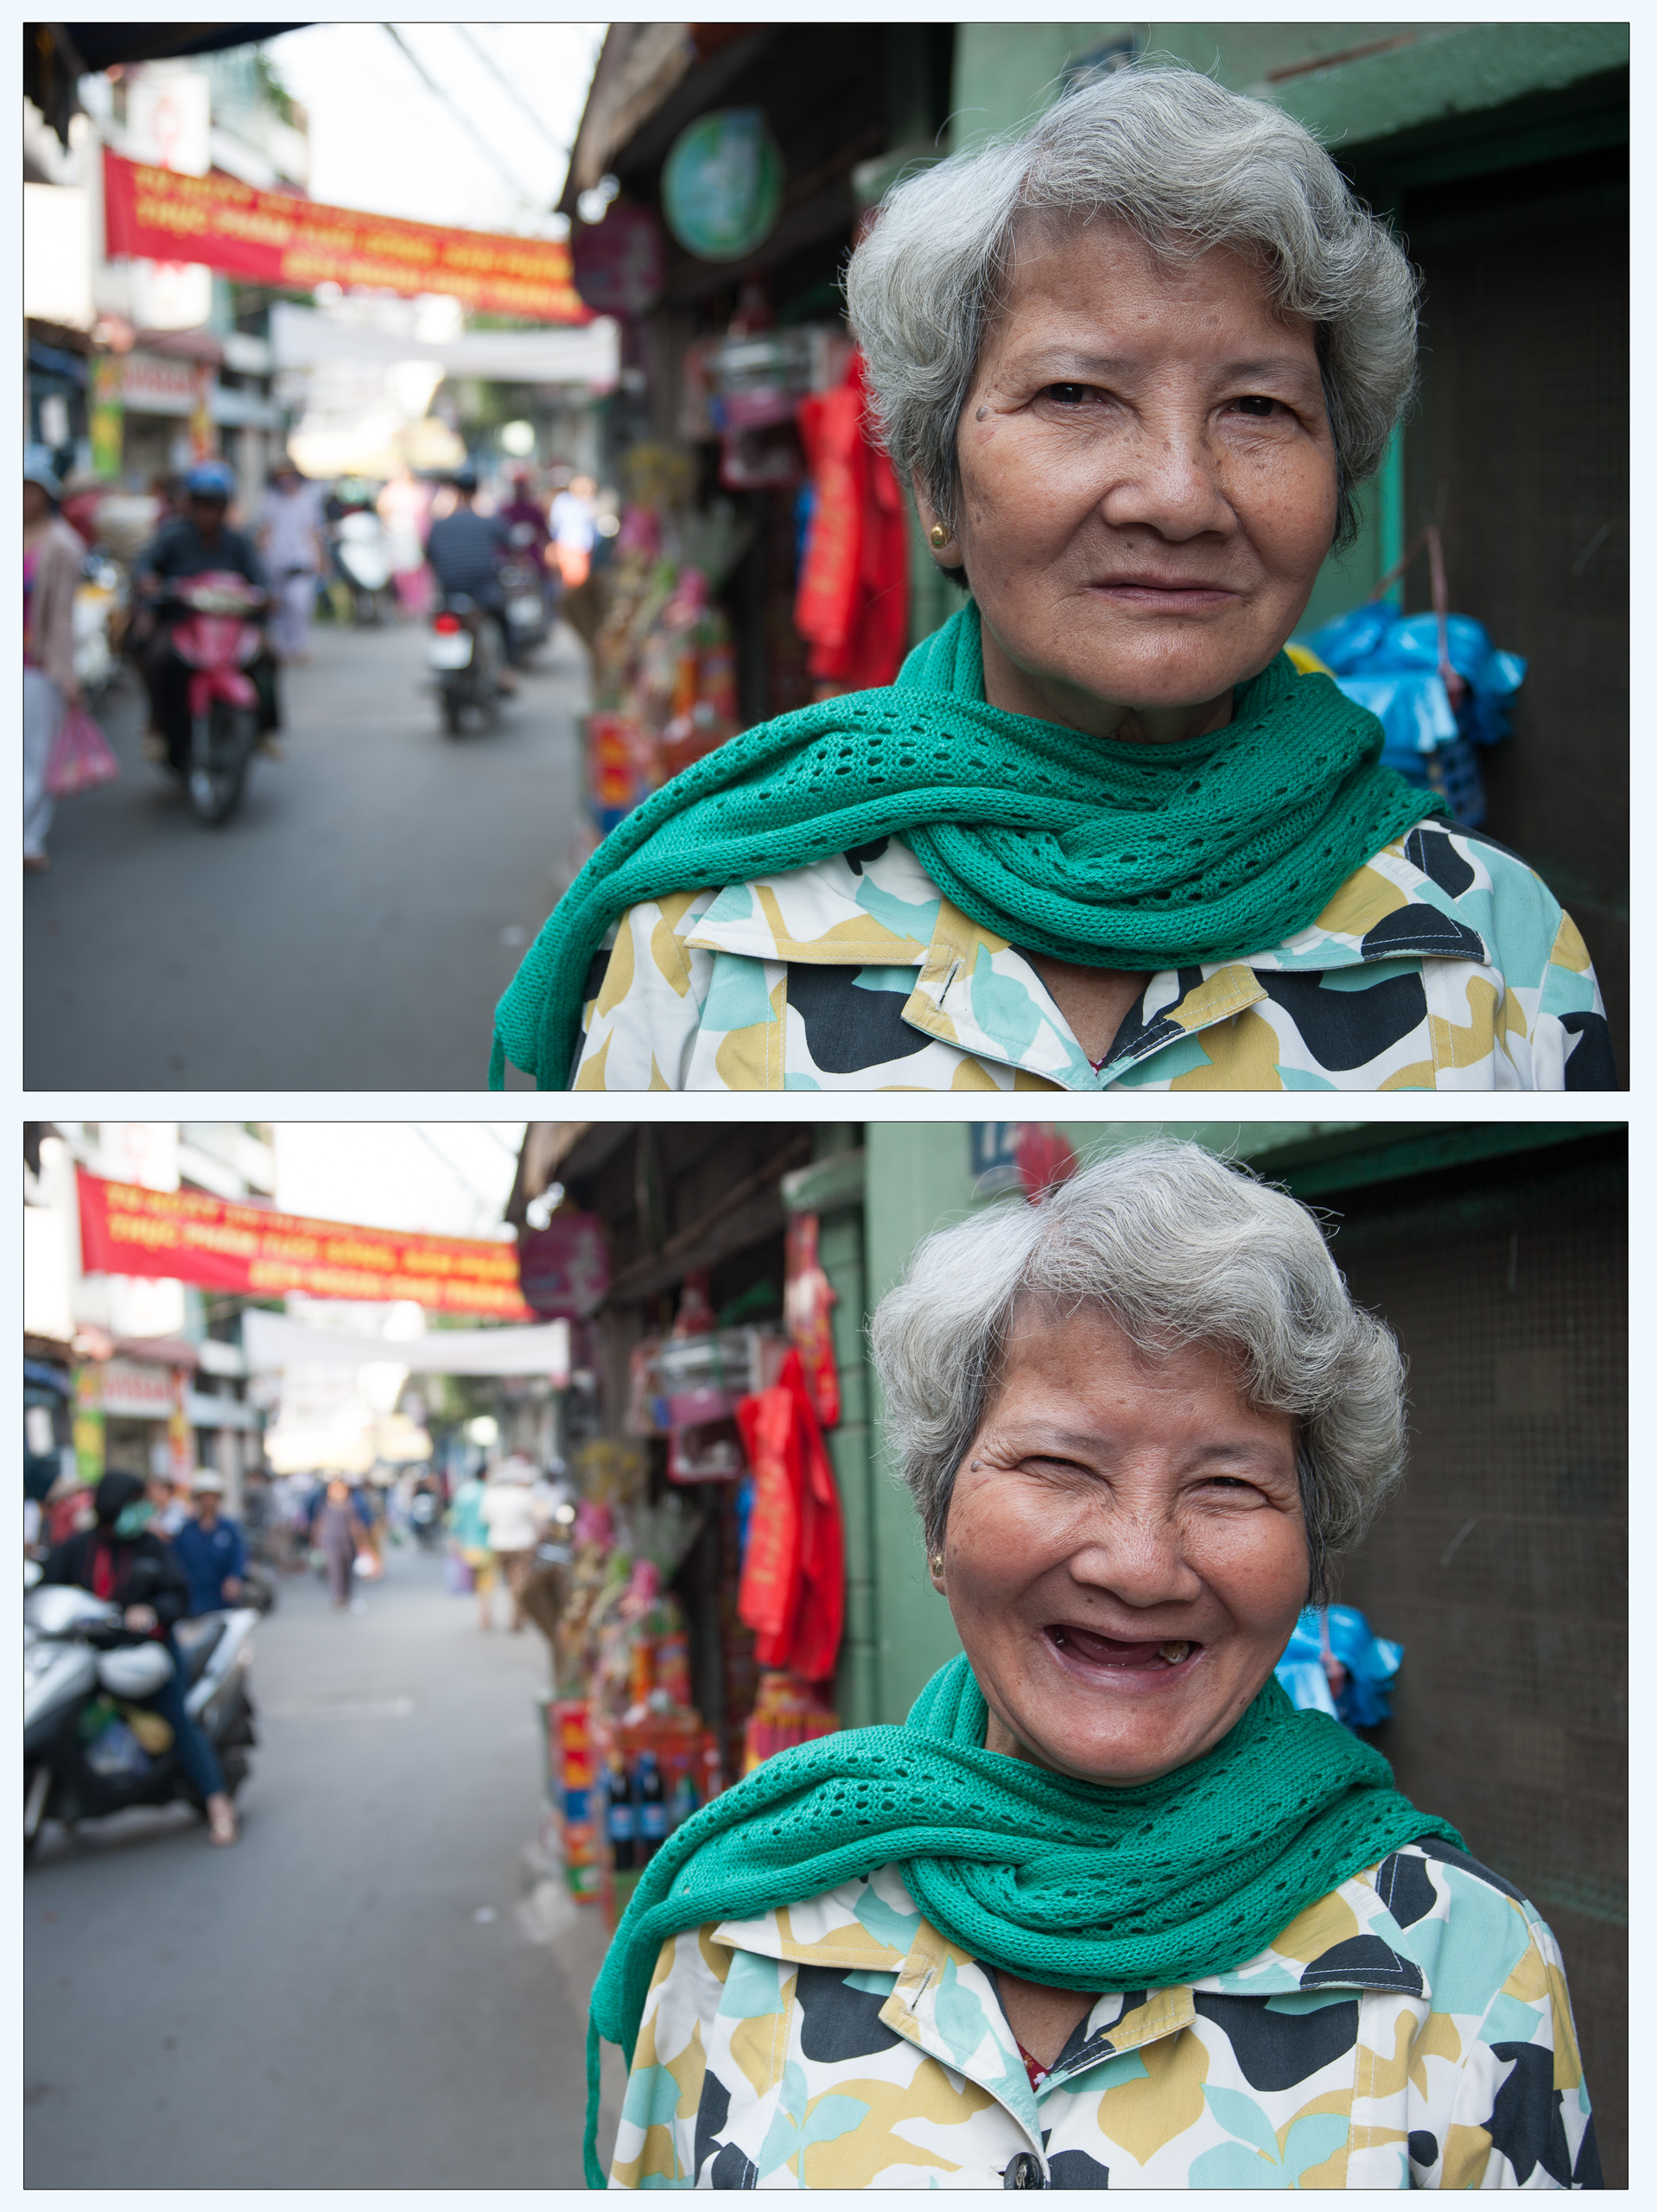 Grandmother of 7, Saigon market